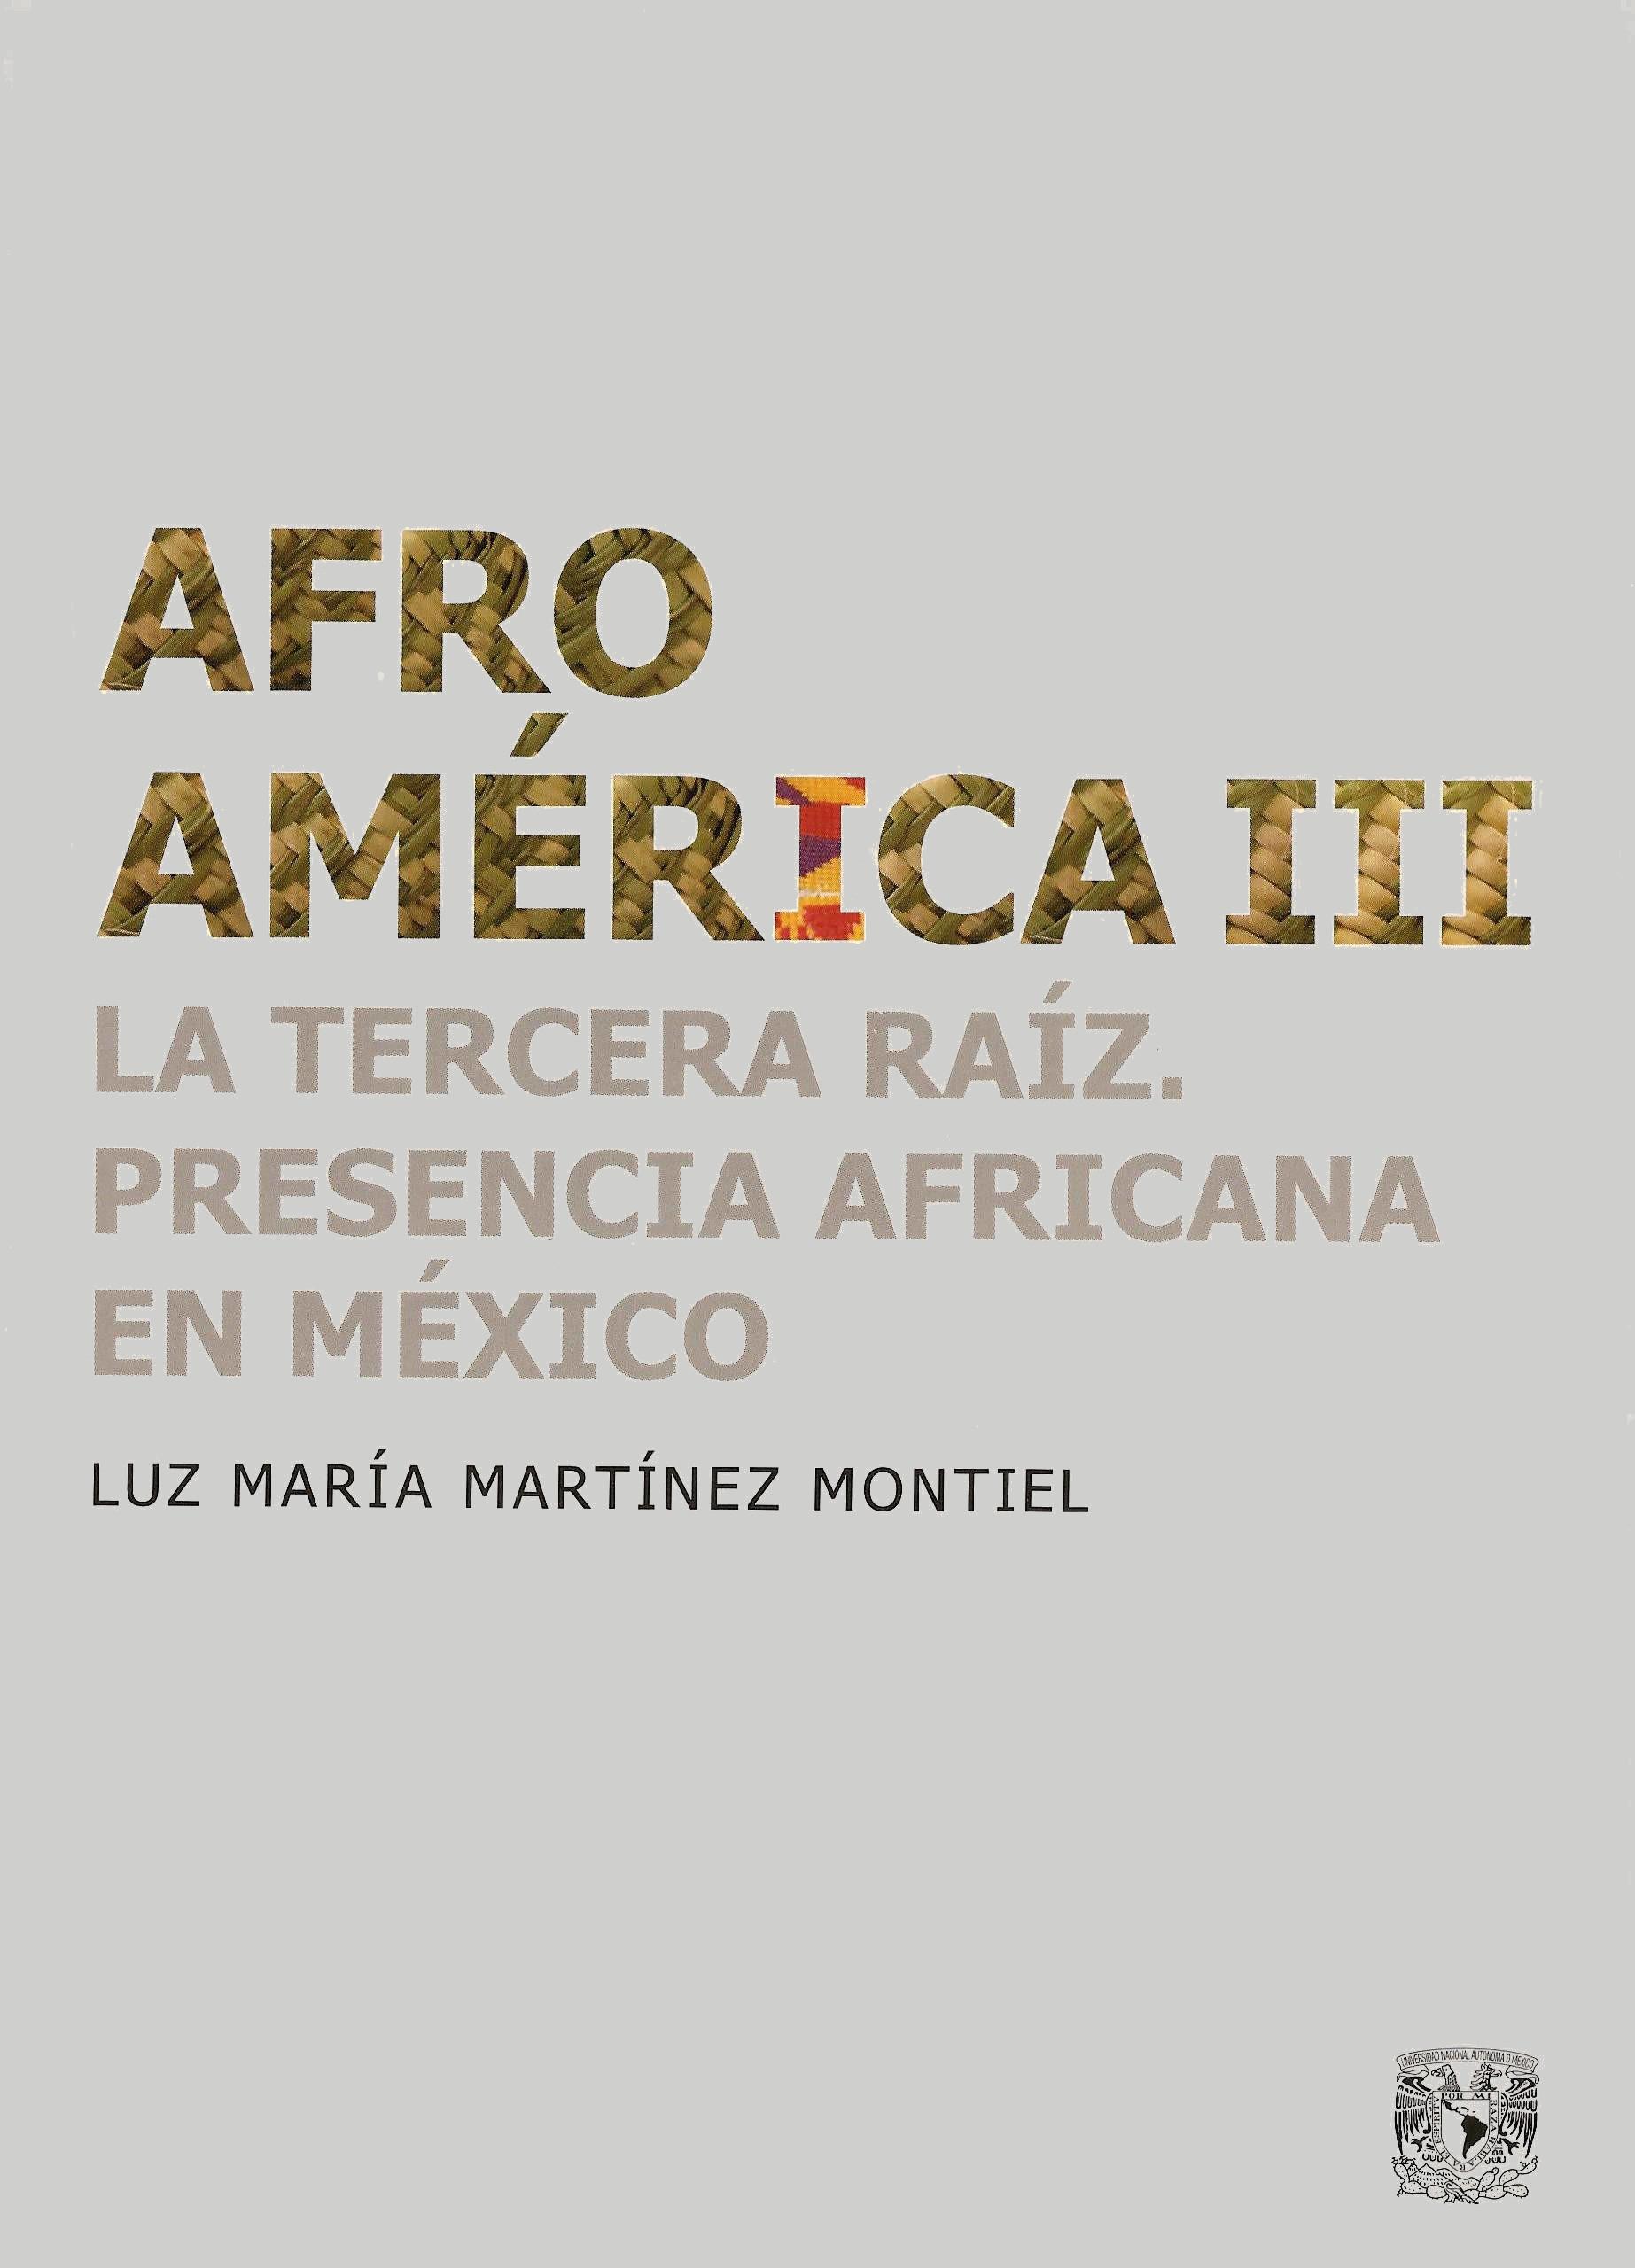 Afroamérica III. La tercera raíz. Presencia africana en México